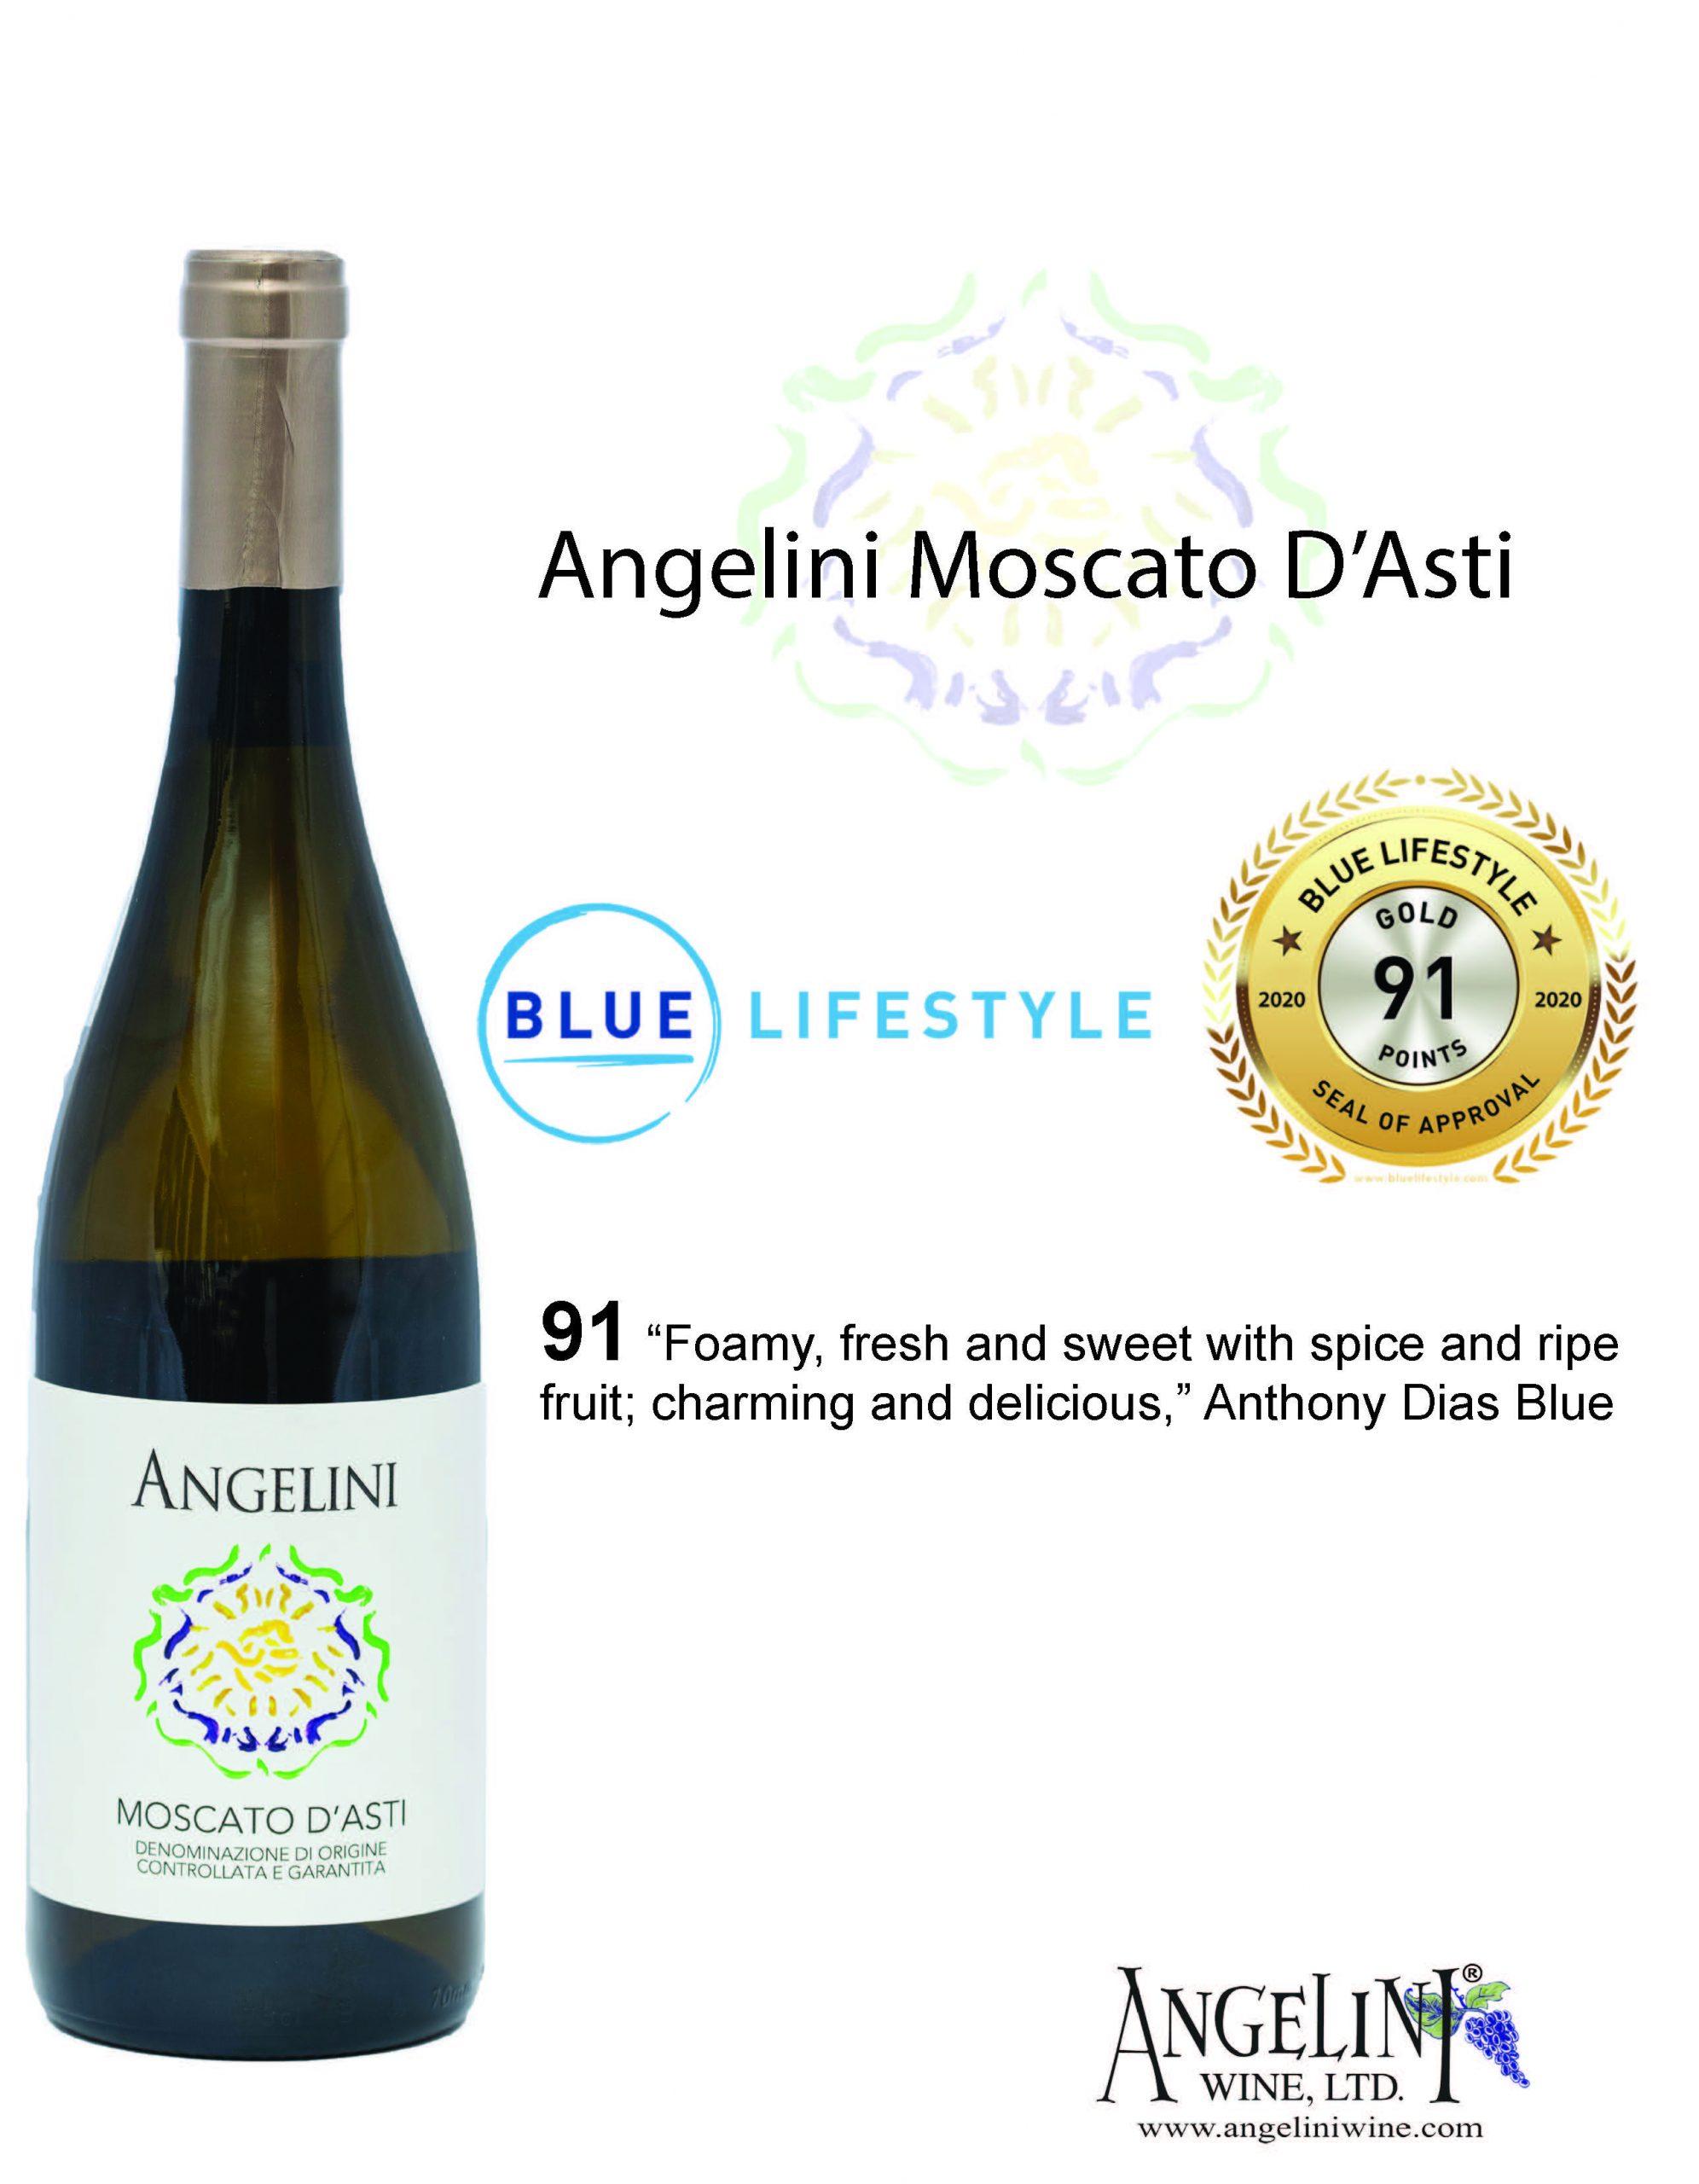 https://www.angeliniwine.com/wp-content/uploads/2021/03/Angelini-Moscato-BL-91-scaled.jpg